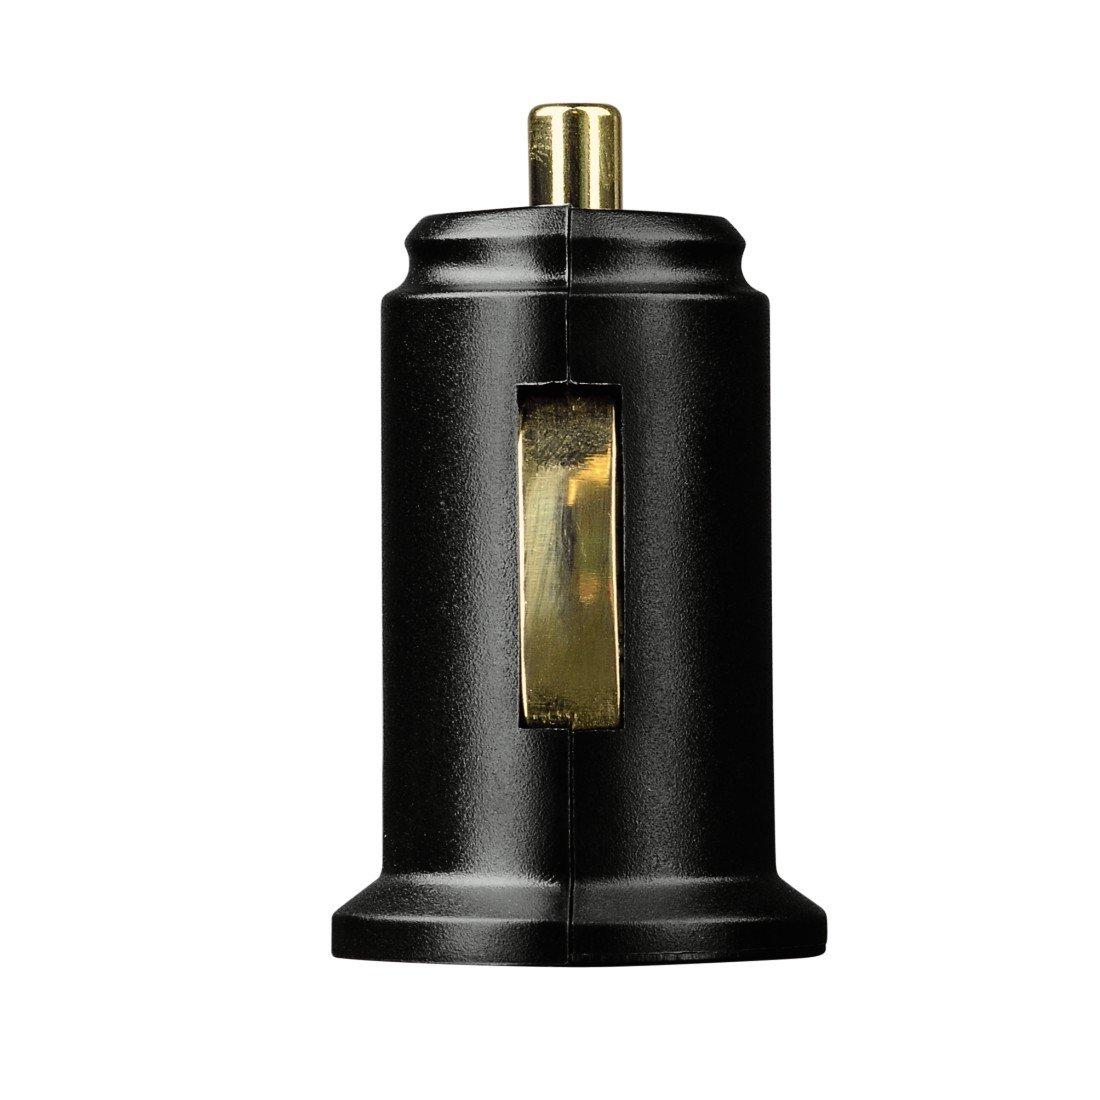 Hama - Cargador USB para Coche (5V/2,4A), Color Blanco ...